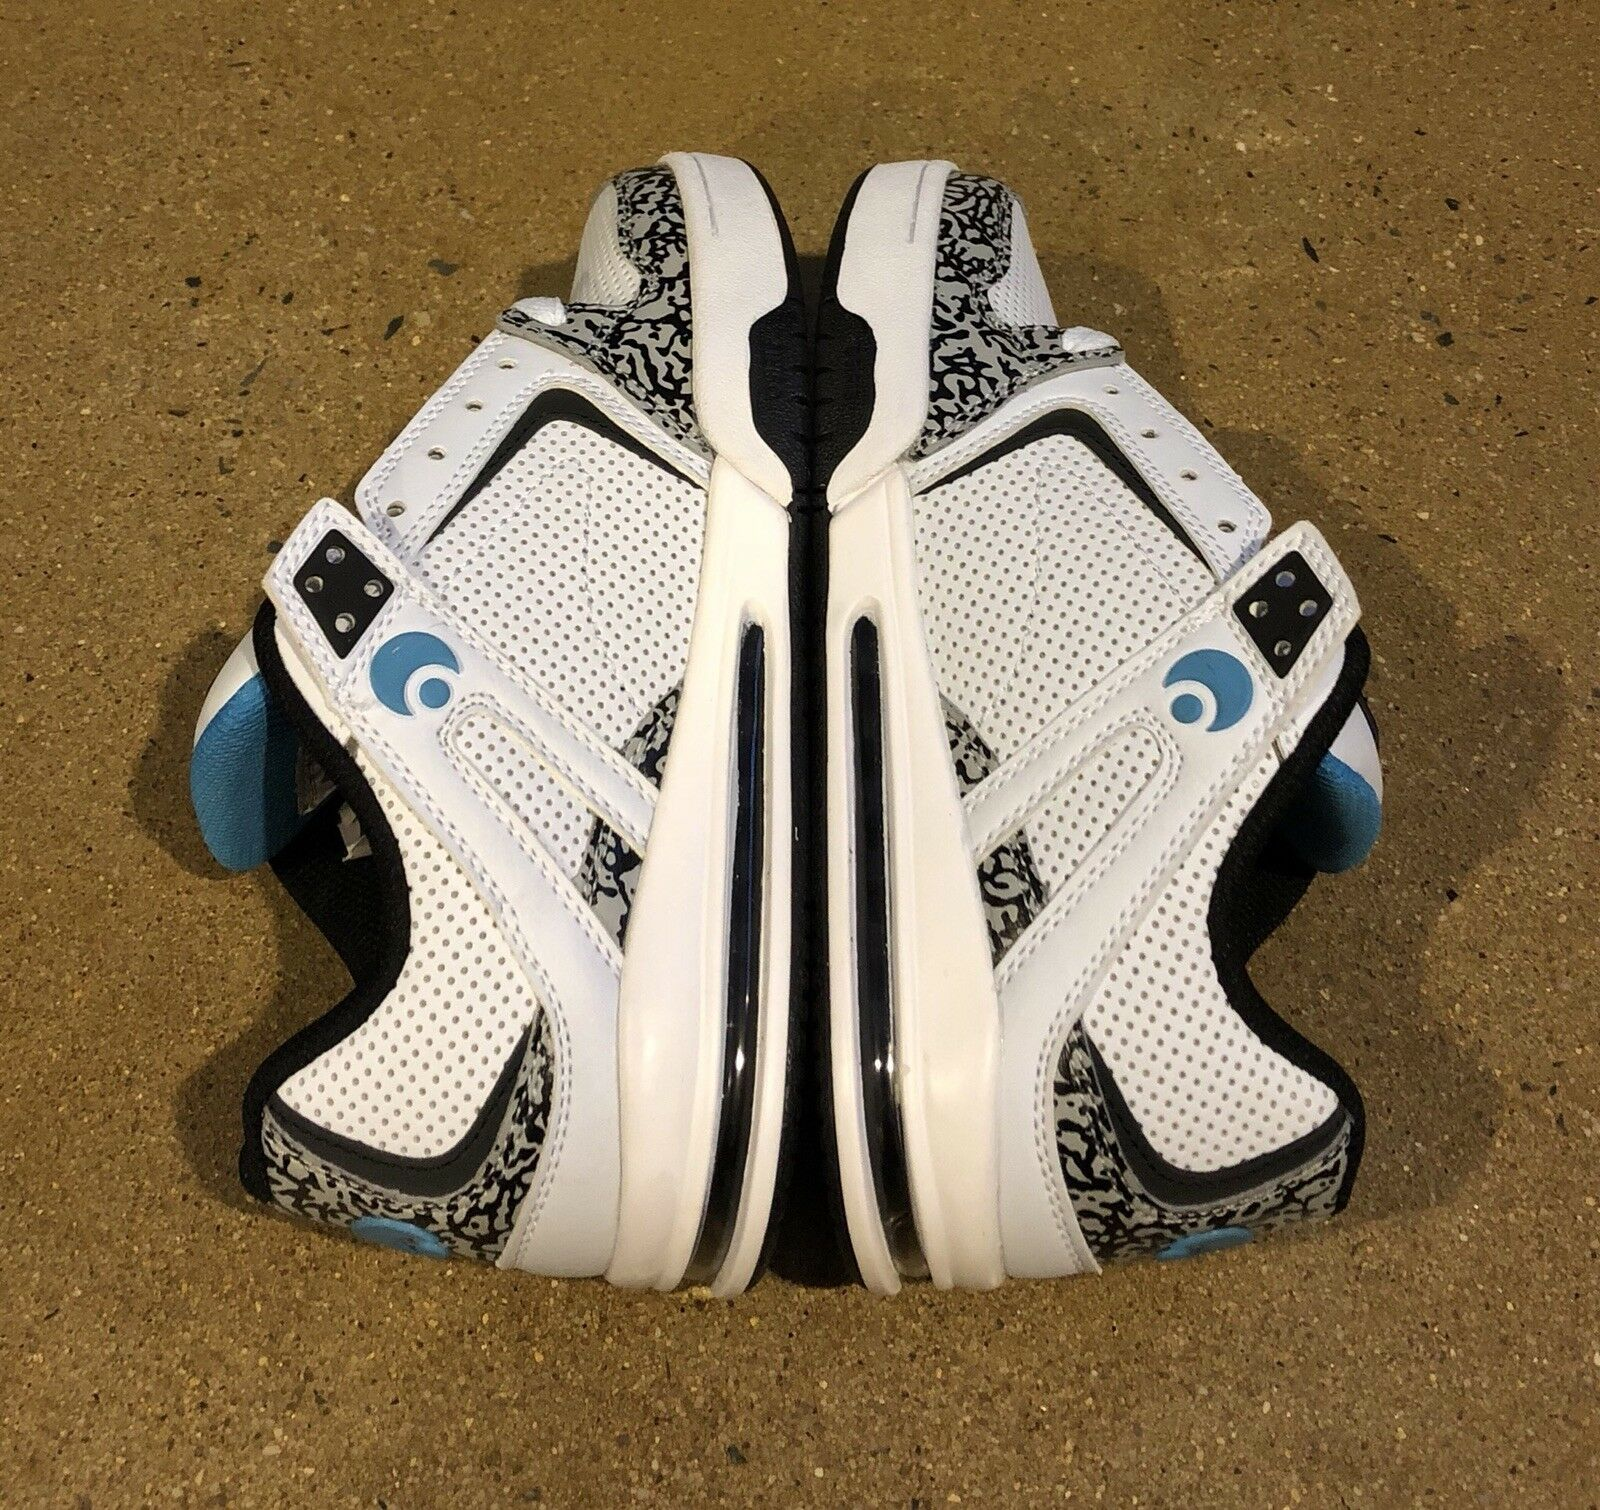 Osiris Pxl Uomo's Size 5.5 US White Cyan Elephant Peril BMX DC Skate Shoes